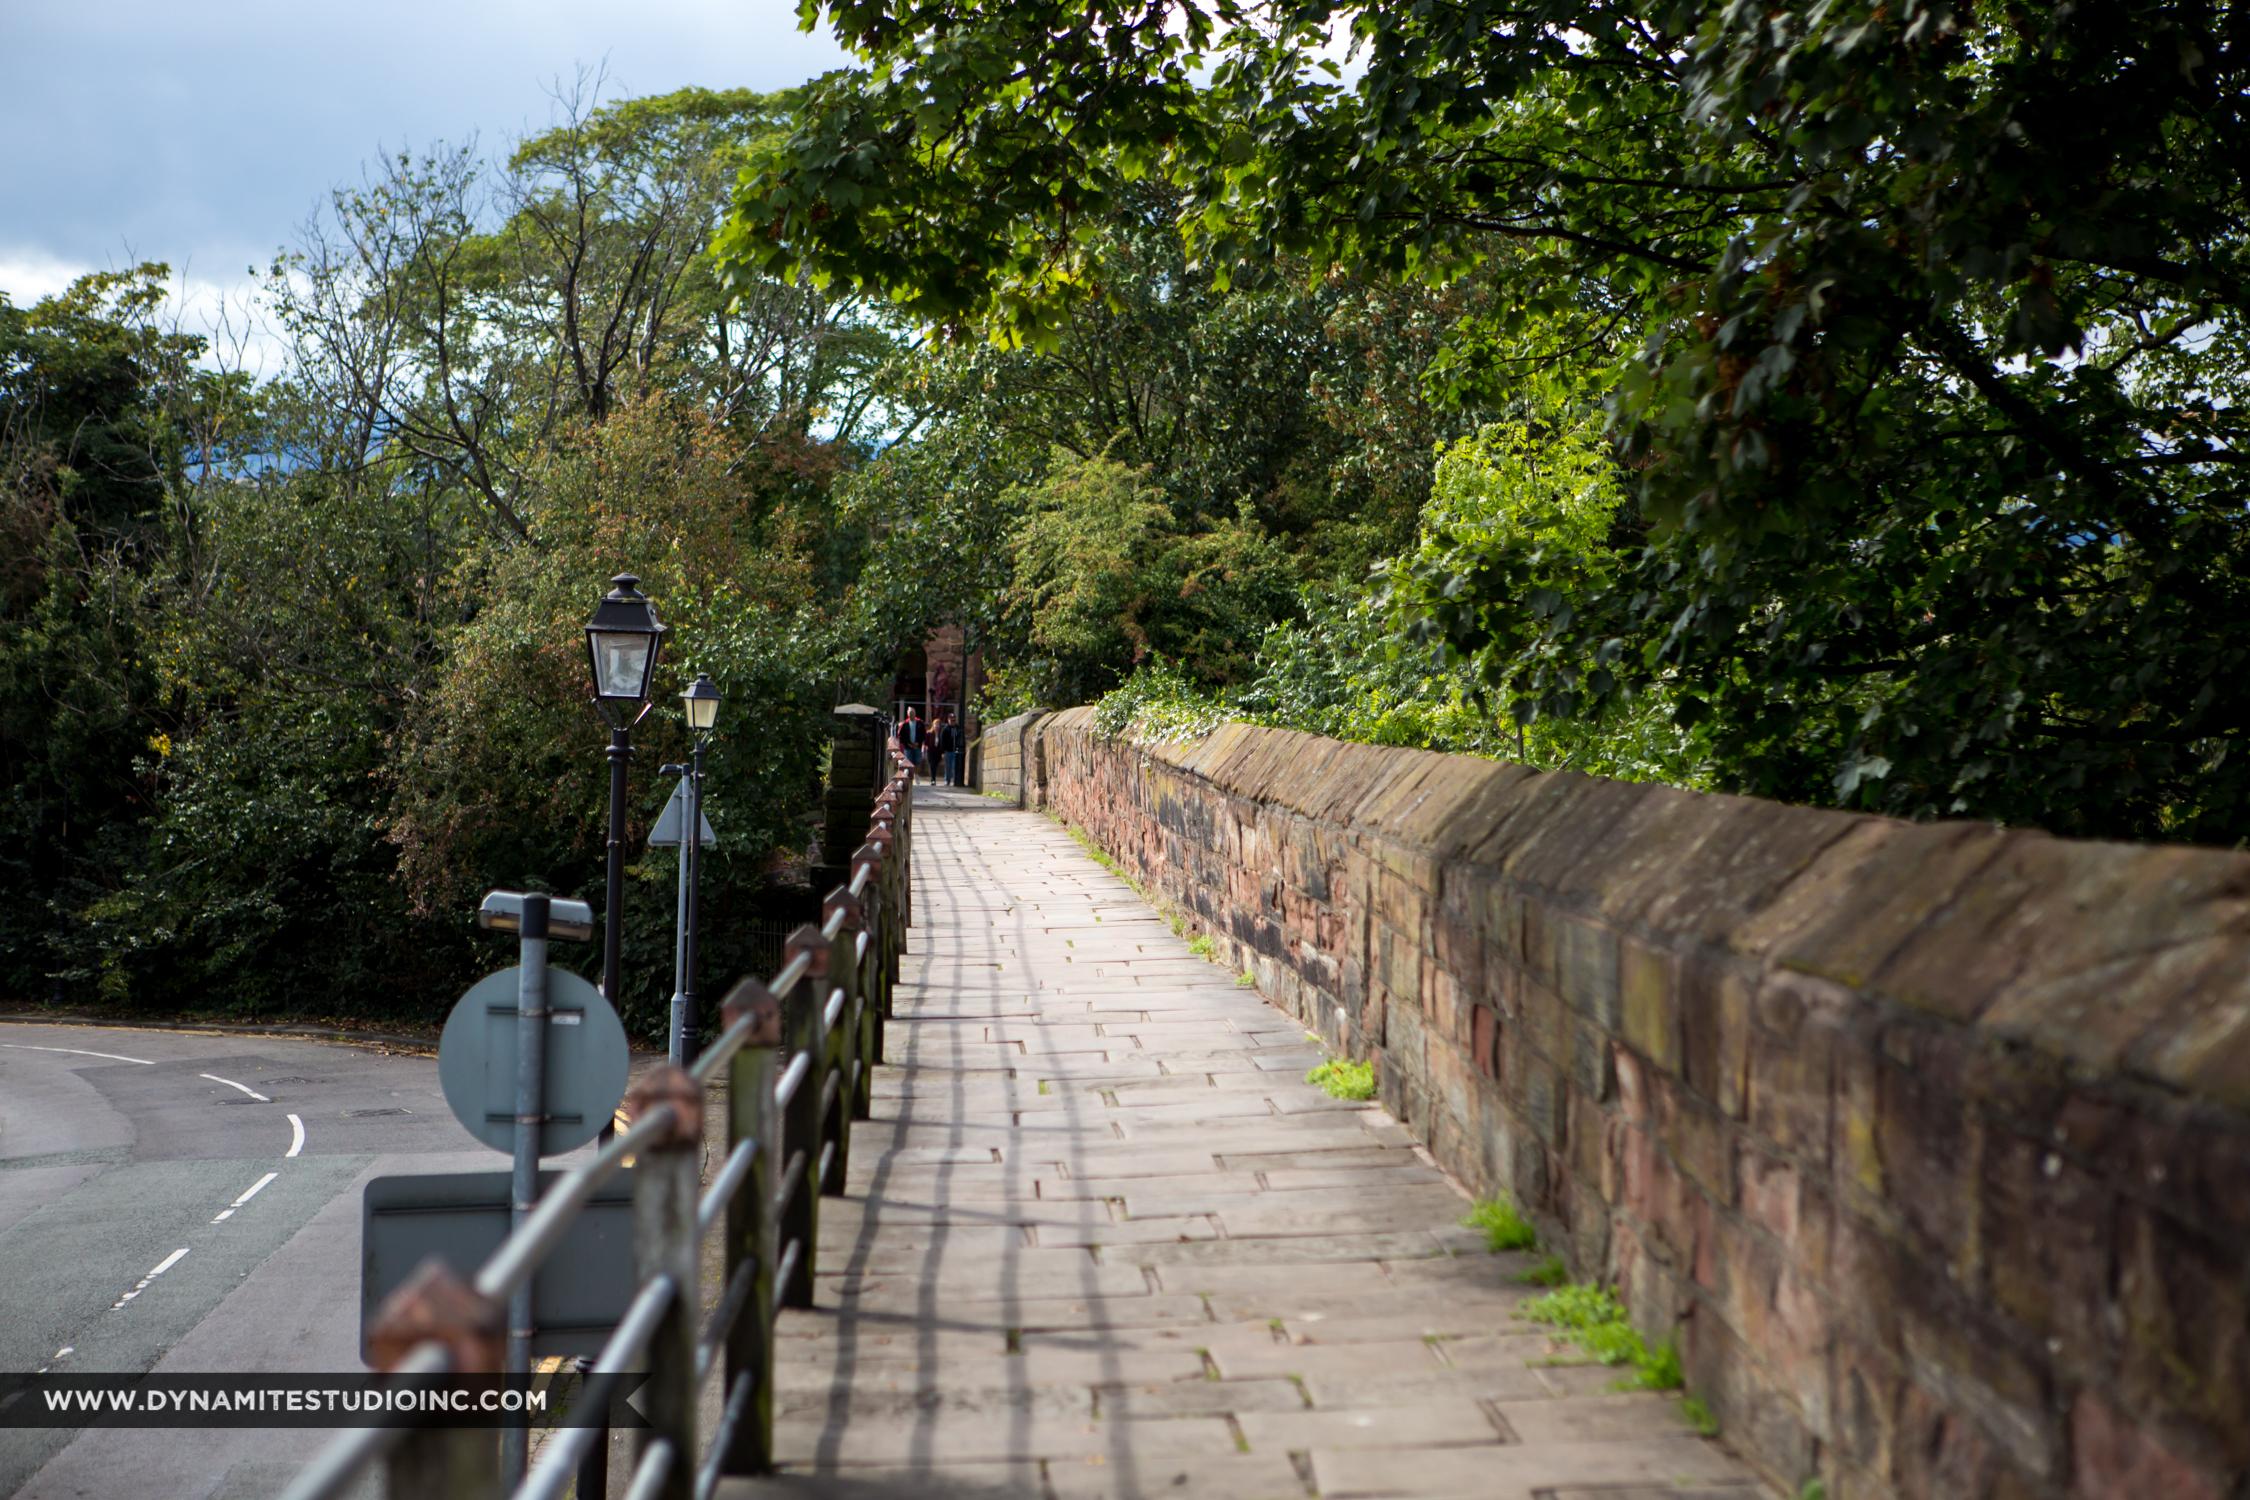 www.dynamitestudioinc.com-chester-england-travel-photography-orlando-34.jpg